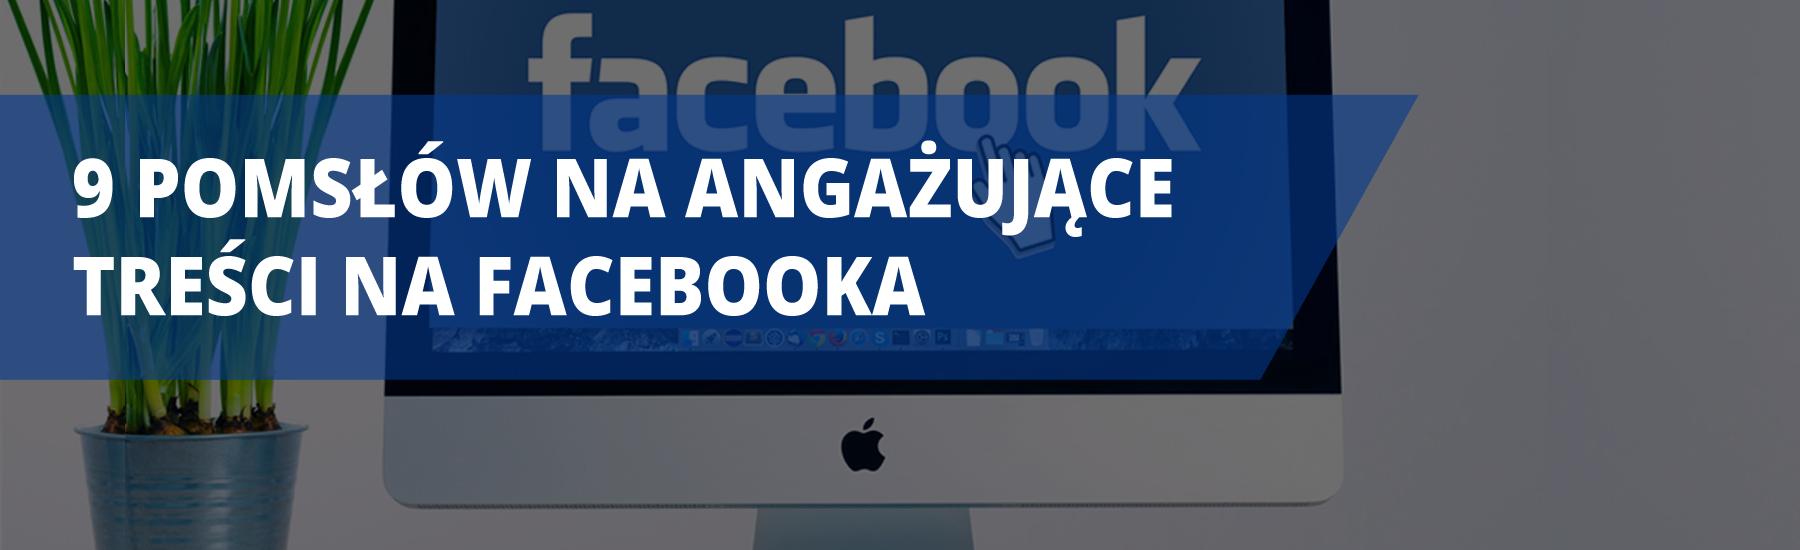 Pomysły na angażujące treści na Facebooka